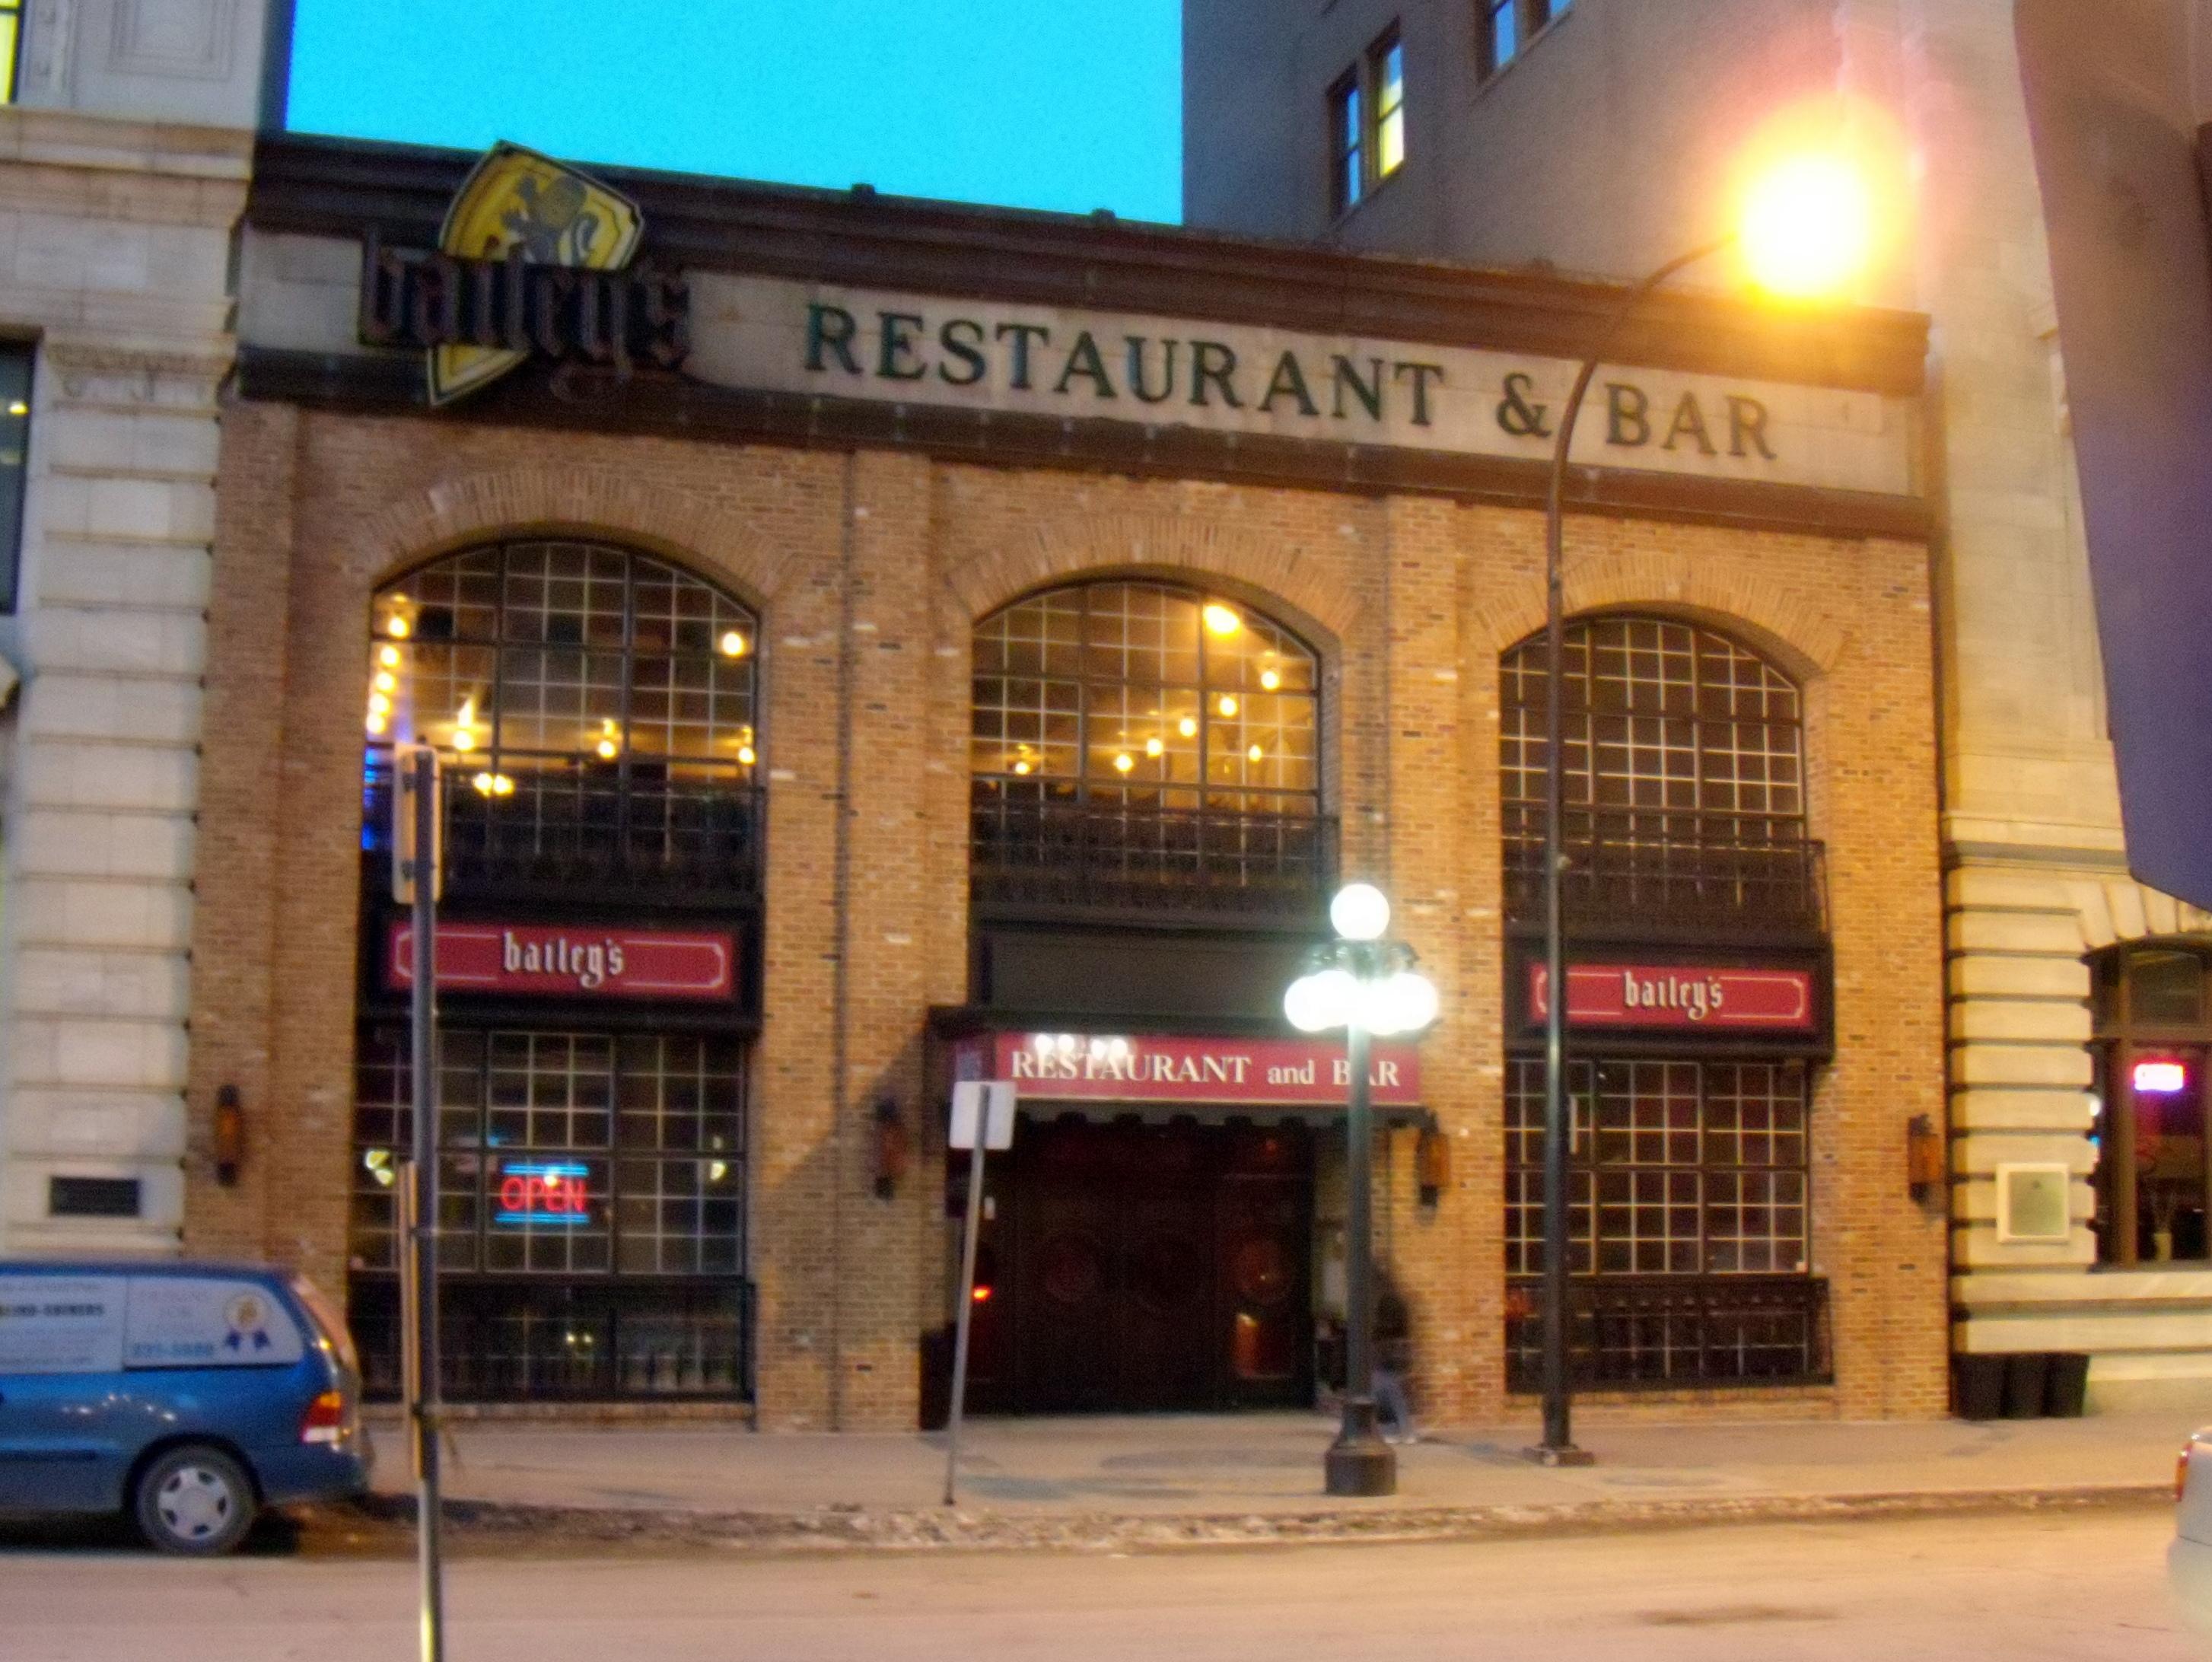 The Avenue Bar Restaurant Glasgow